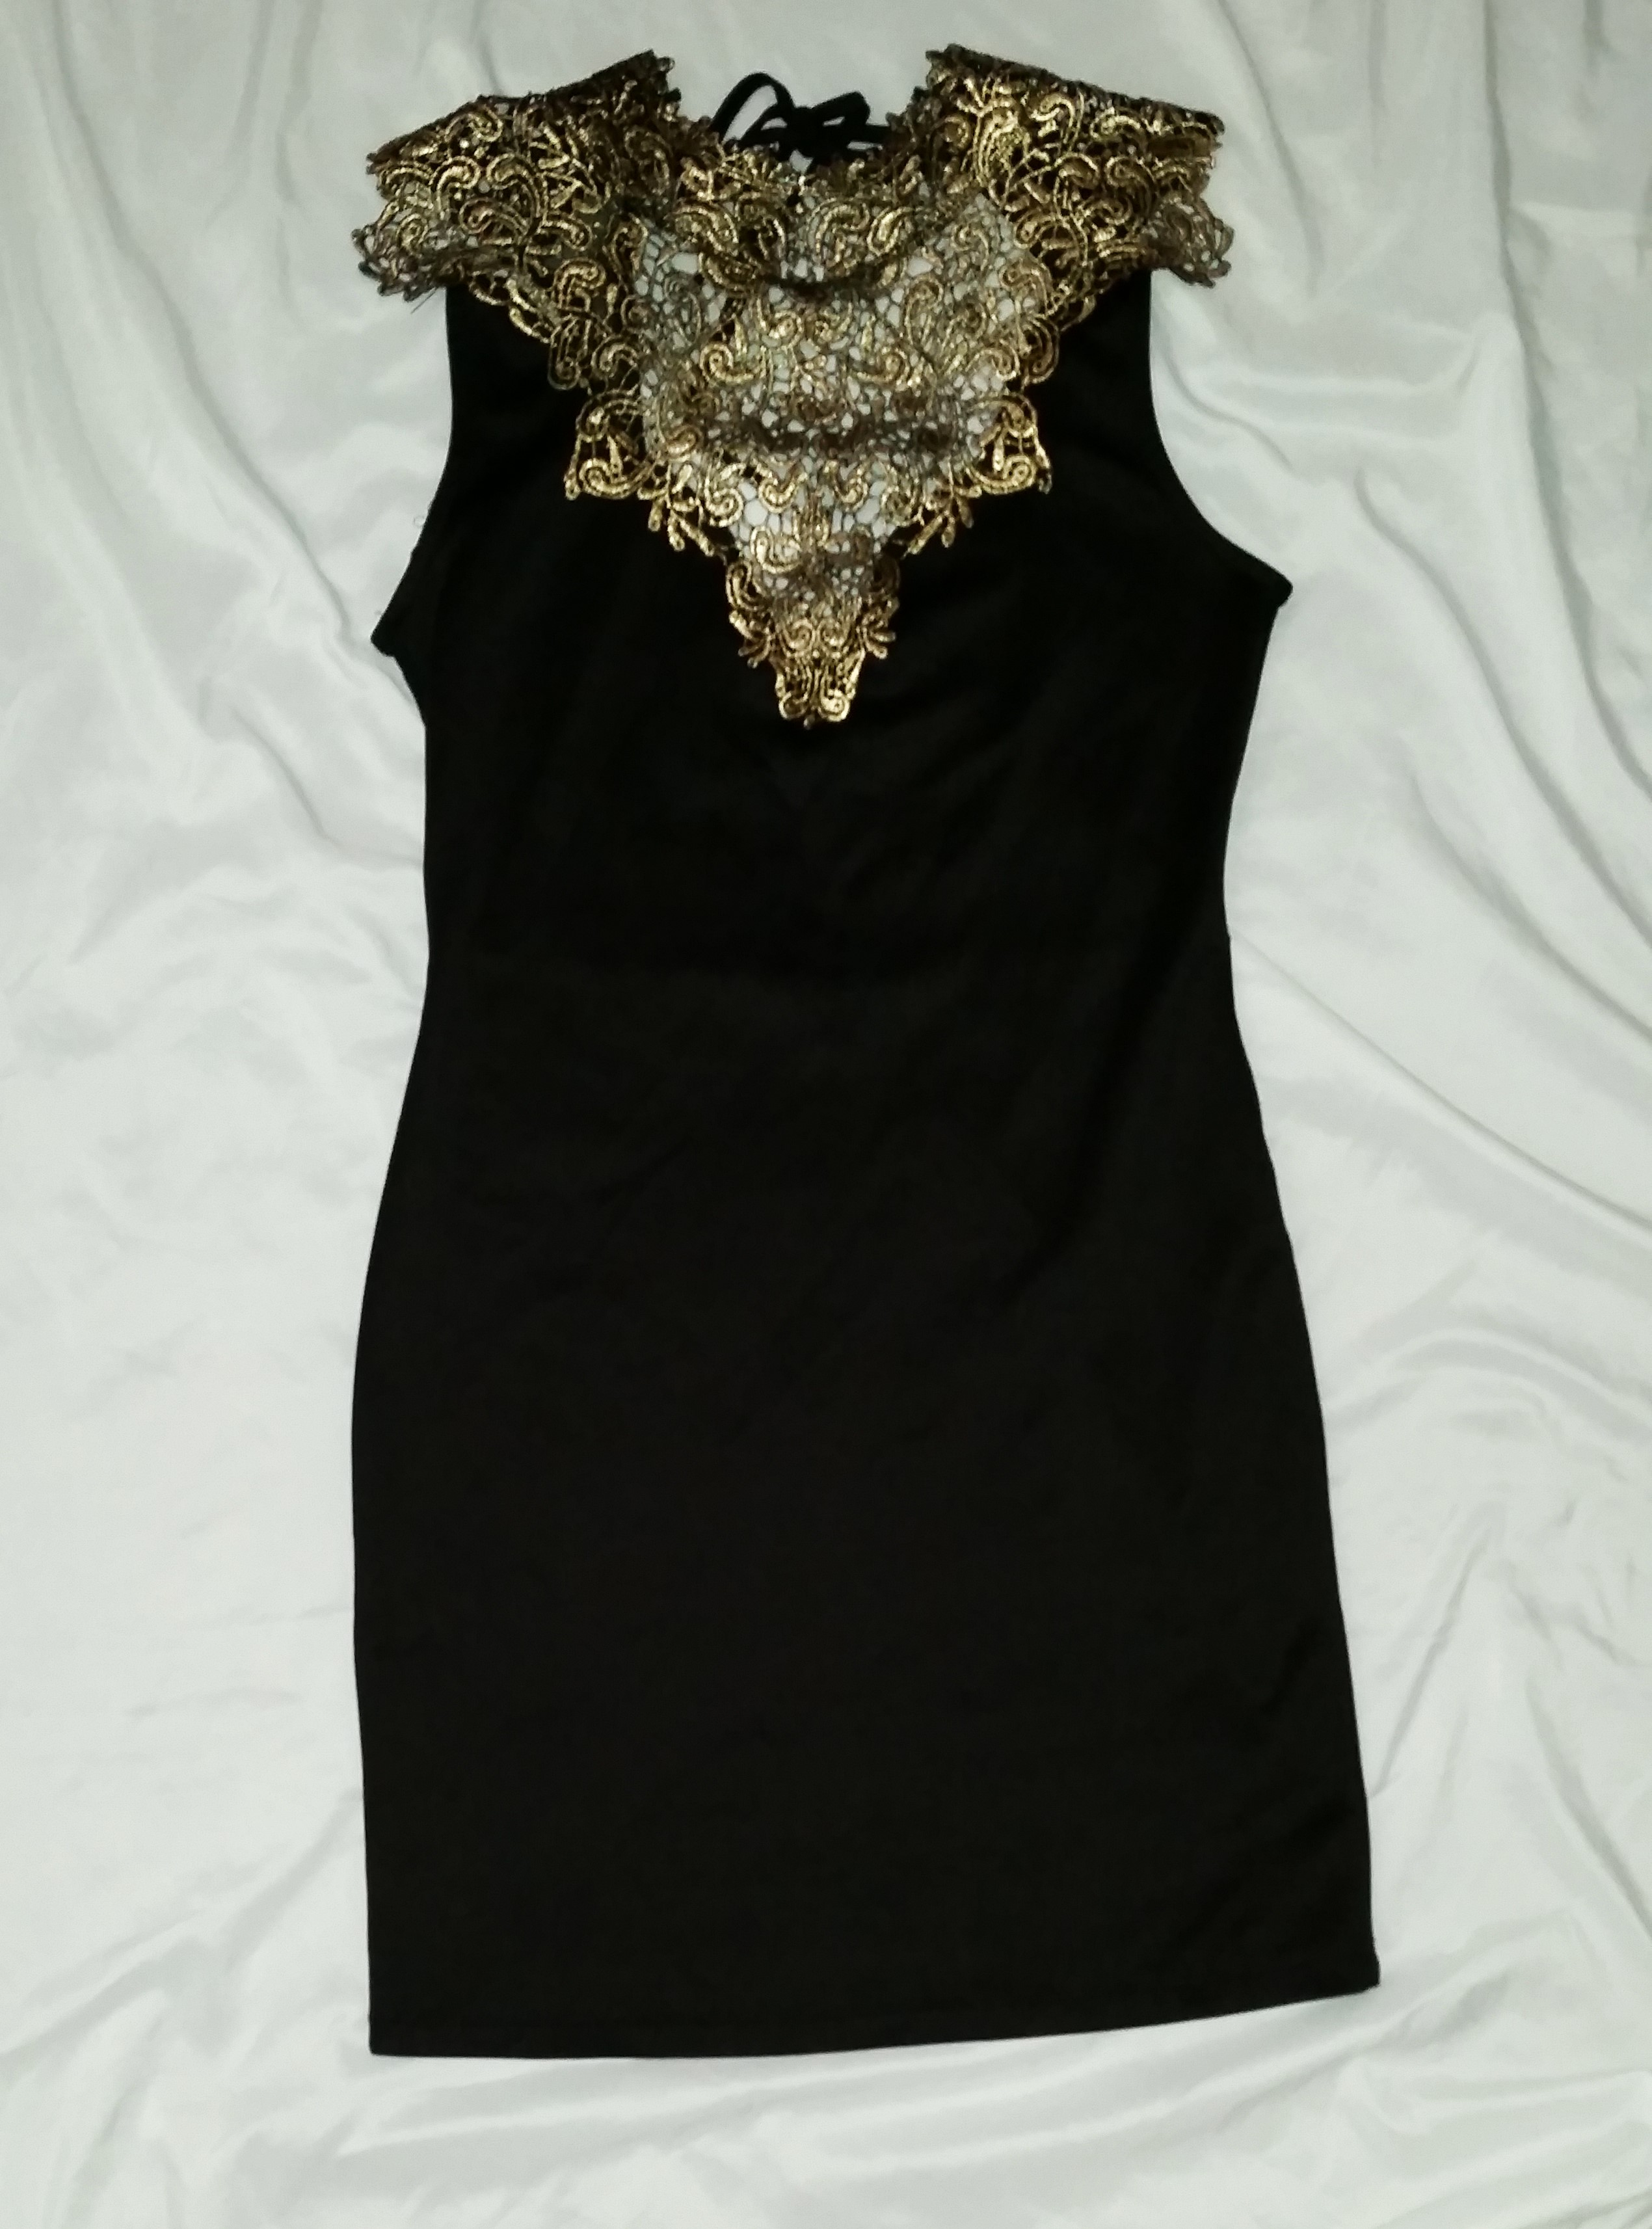 e7a4912c42bcf Charlotte Russe gold embroidered black dress sz M on Storenvy